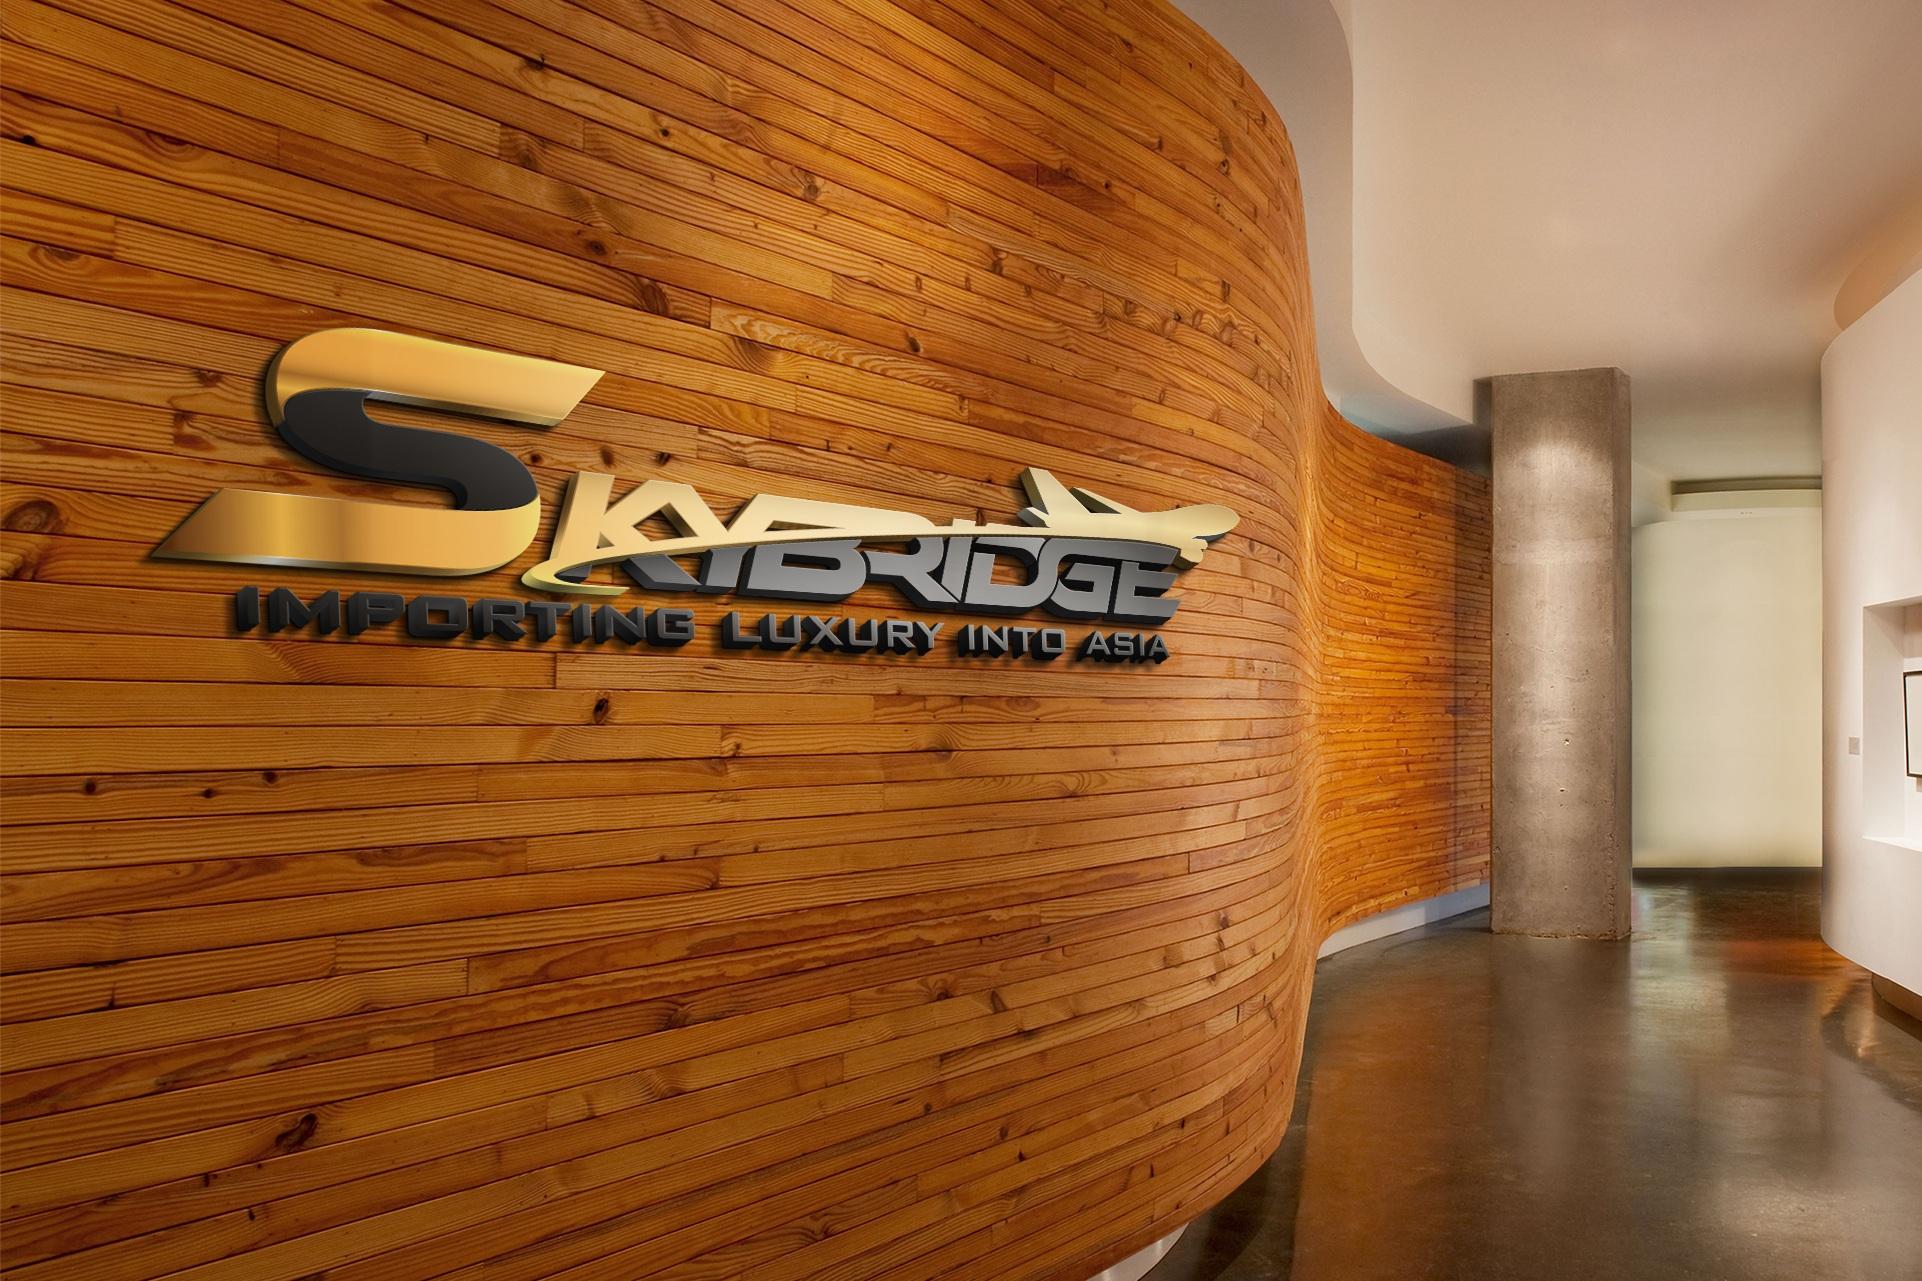 Skybridge Office Entrance